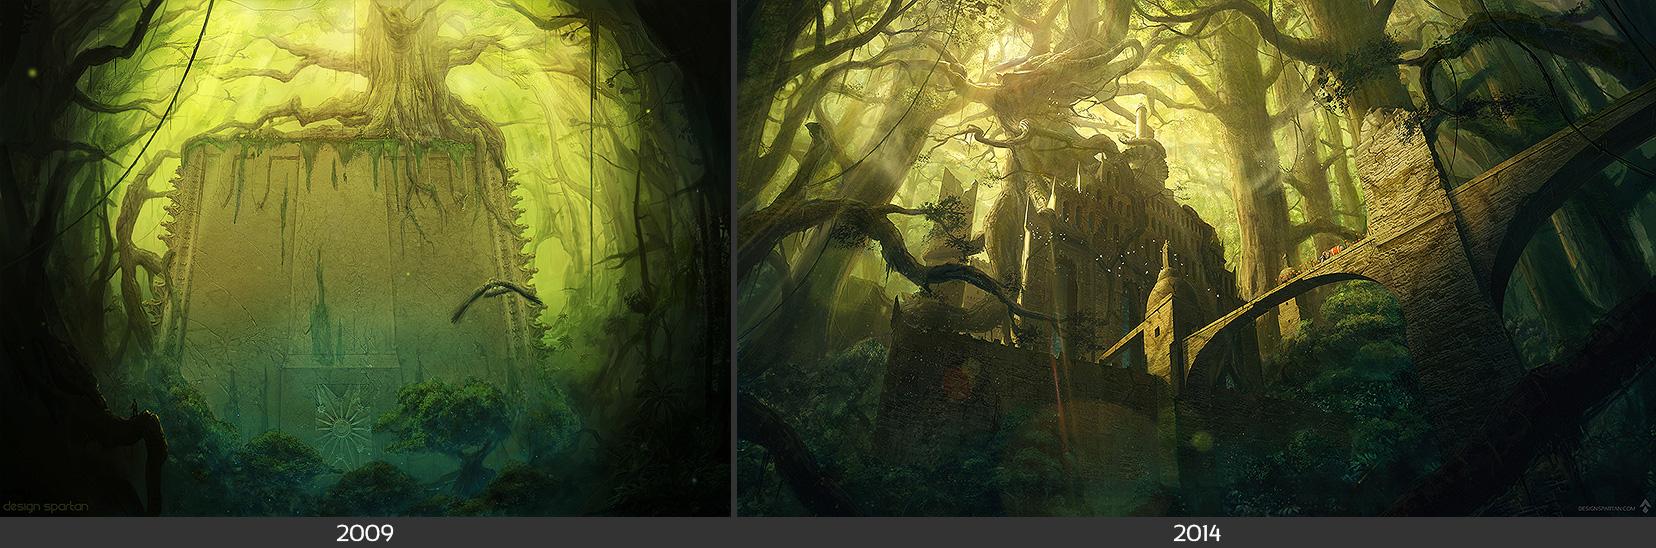 Comparaison : «The Fortress II», digital painting de Spartan